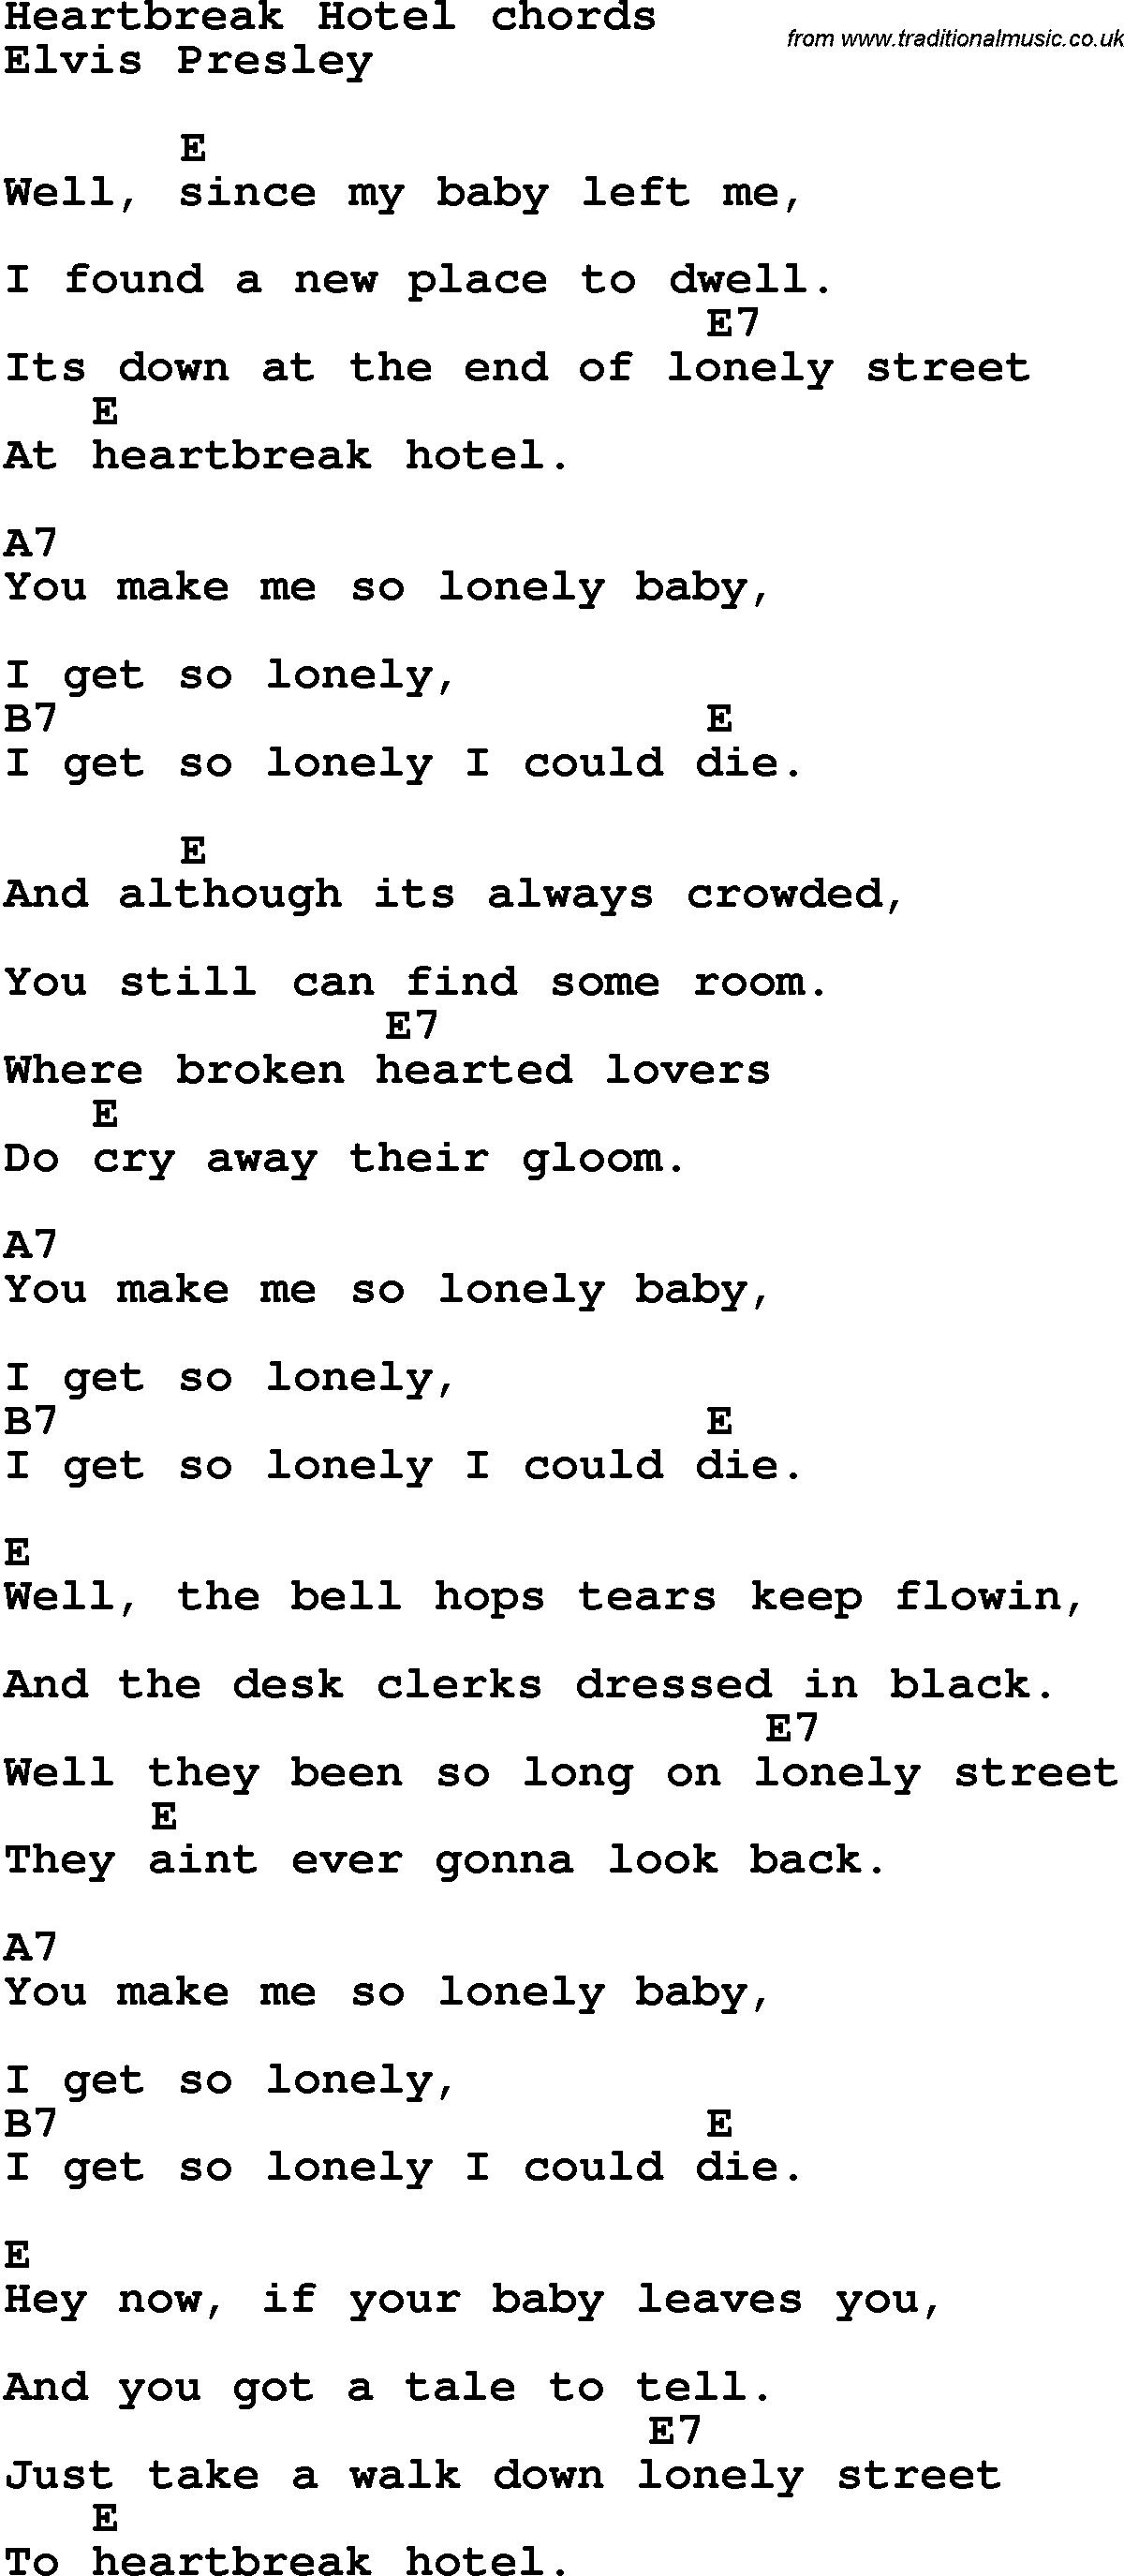 Song Lyrics With Guitar Chords For Heartbreak Hotel Sheet Music